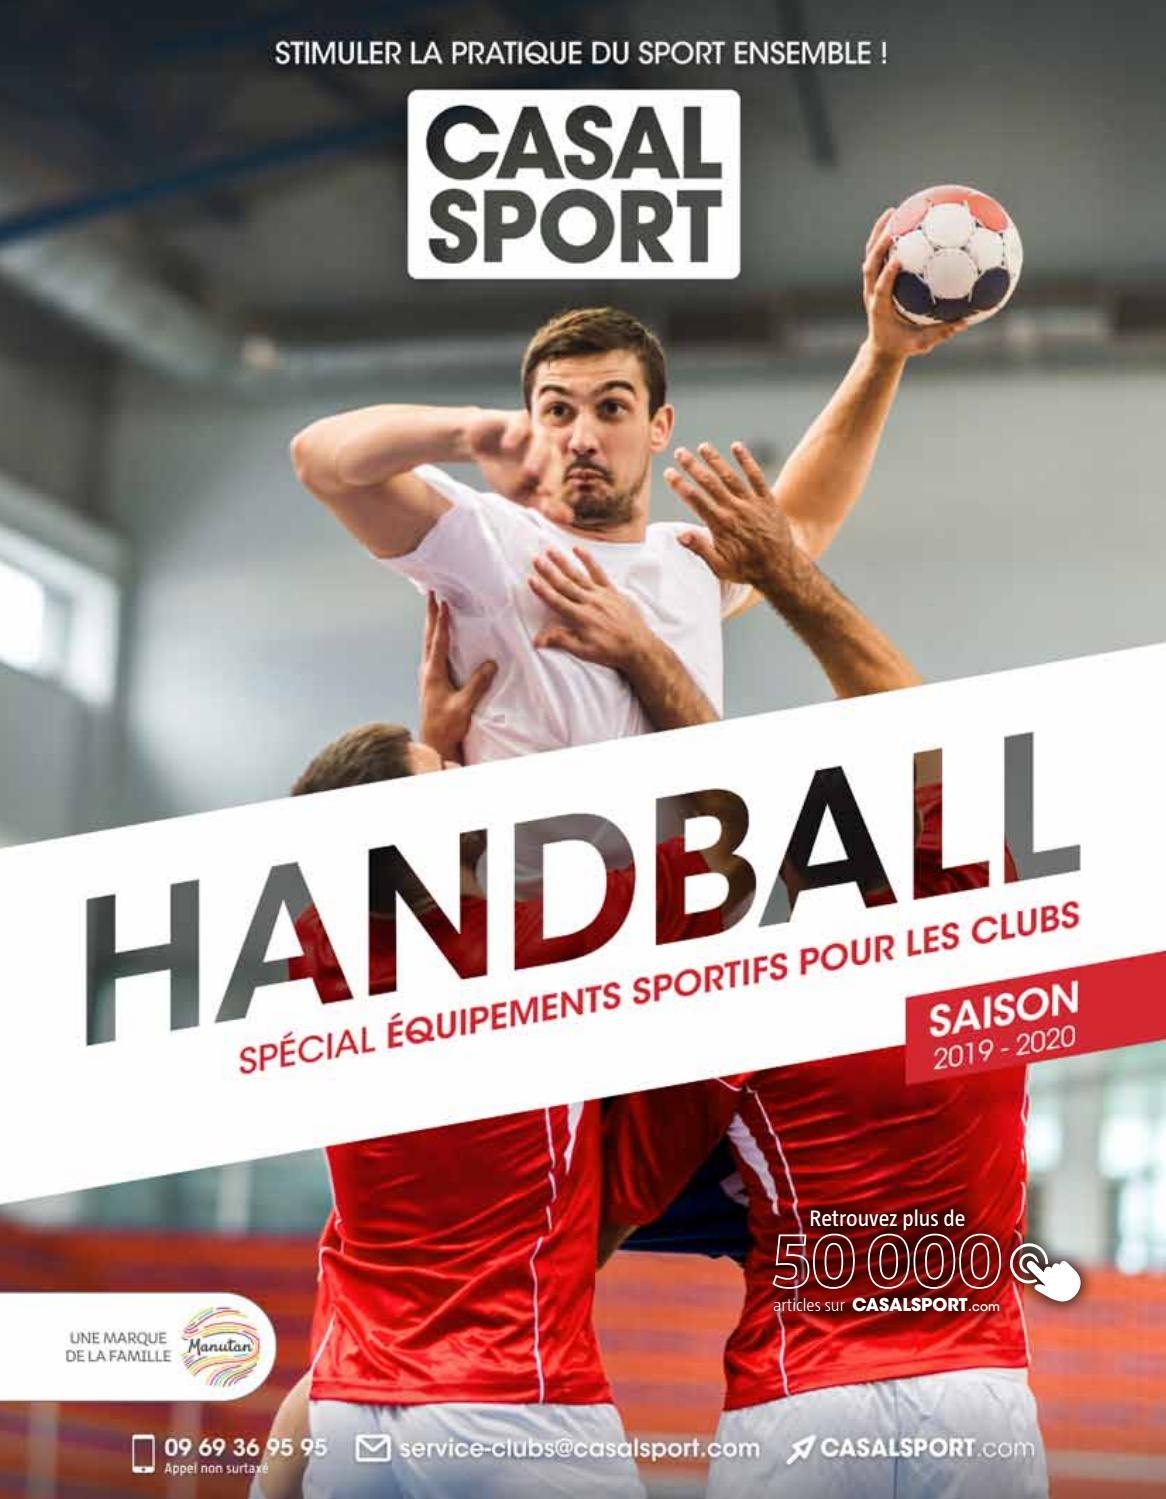 Catalogue Handball spécial Clubs 2019 by CASAL SPORT issuu